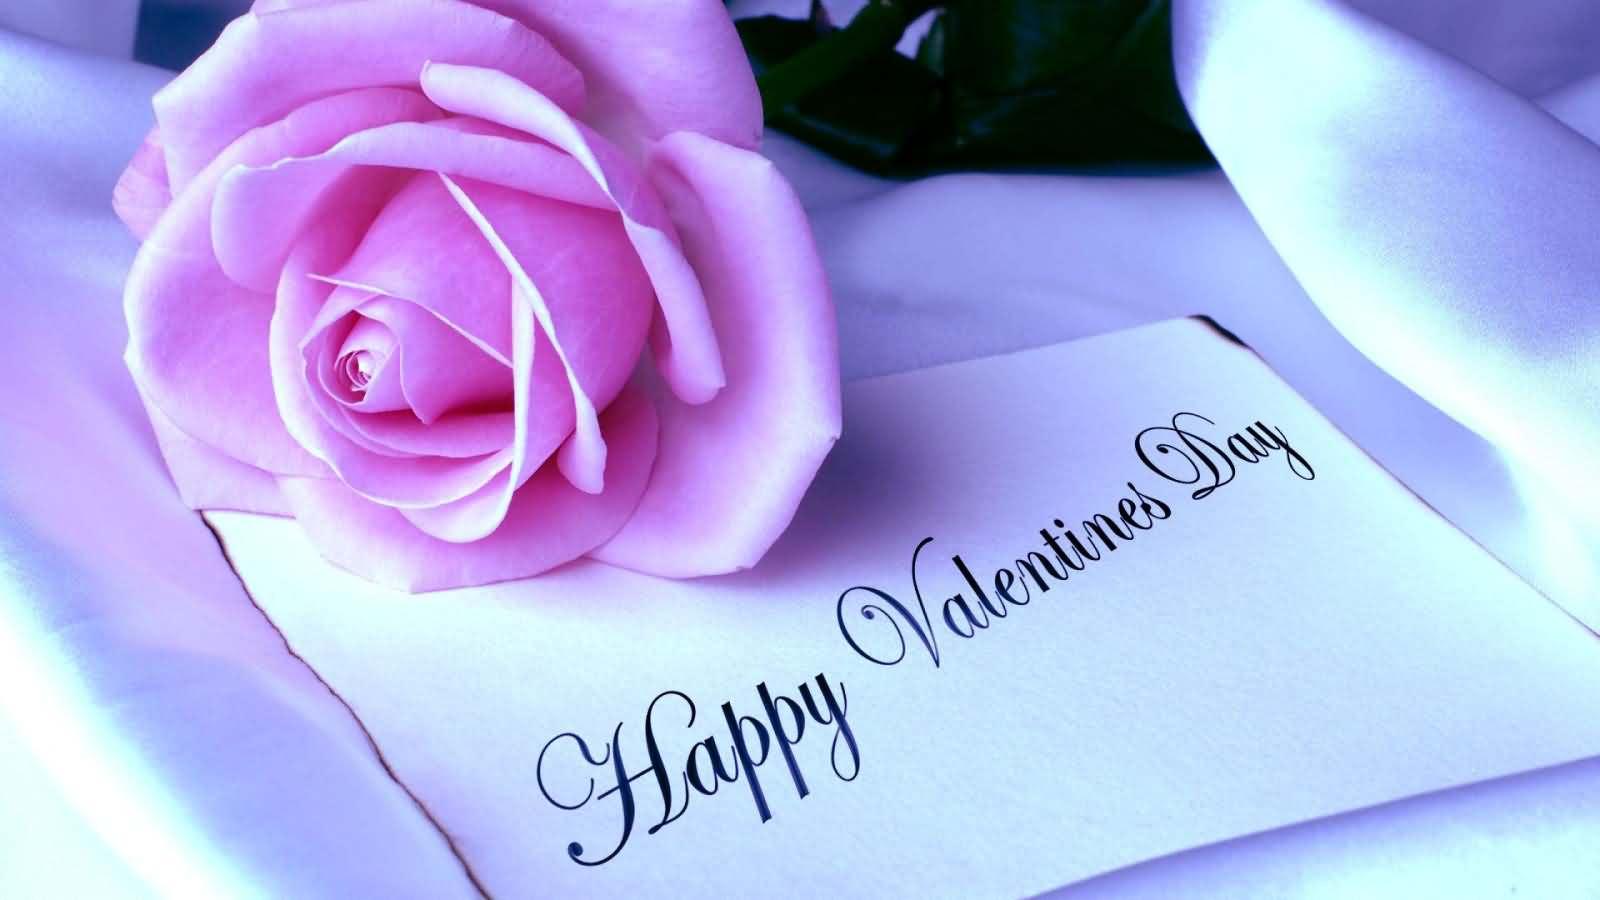 Happy Valentine Roses Wallpaper